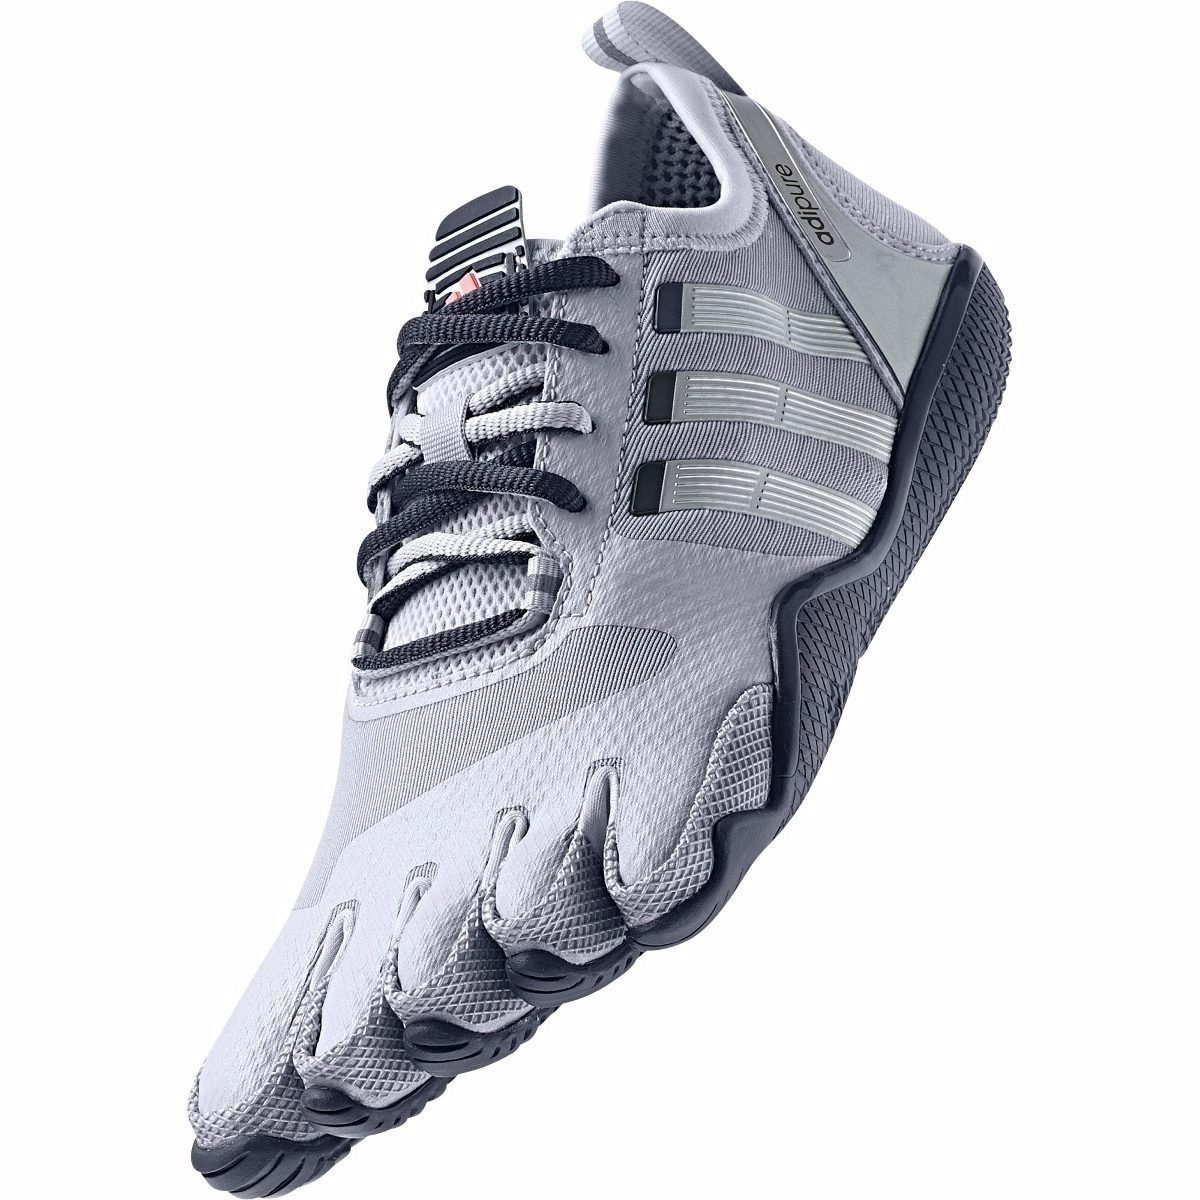 Zapatillas De Zapatillas Adidas De De Adidas Dedos Zapatillas Adidas Dedos Zapatillas Dedos FKJl1Tc